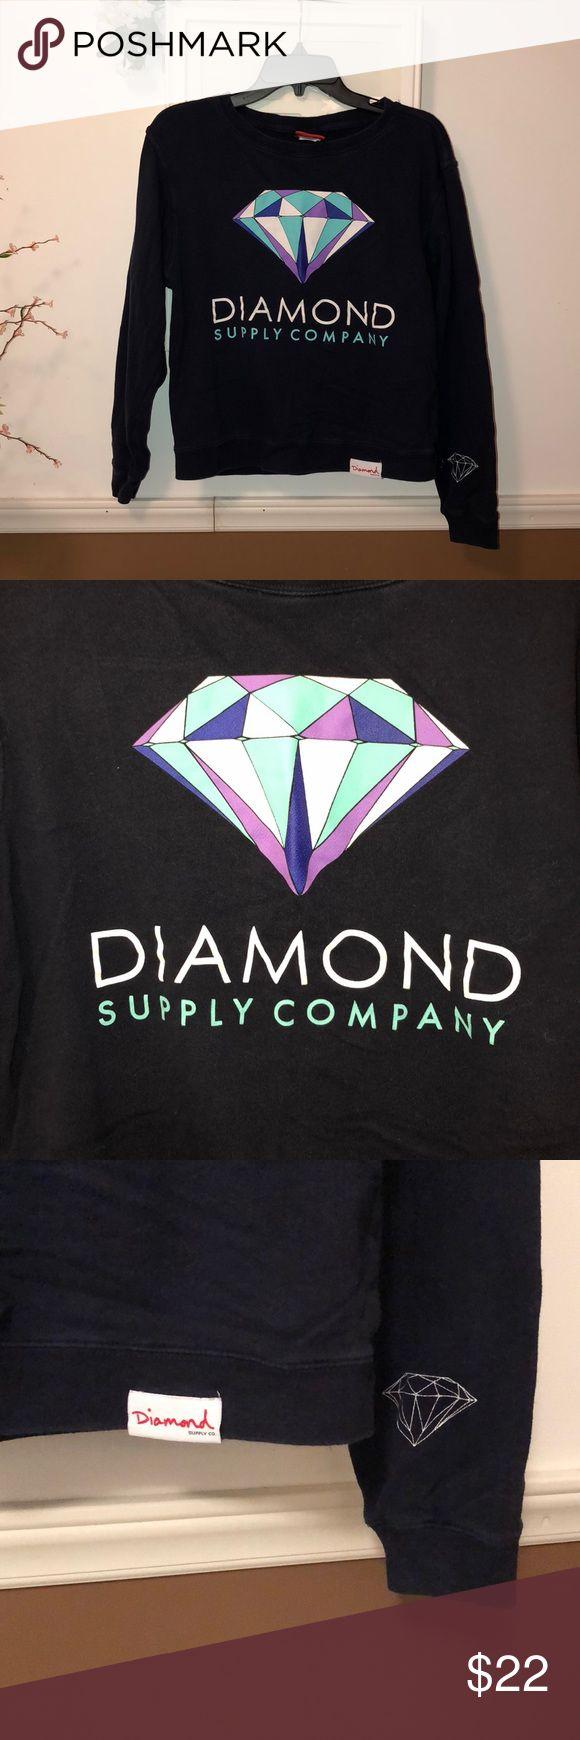 diamond supply company crewneck sweatshirt diamond supply company crewneck sweatshirt, size S, Navy Blue Diamond Supply Co. Sweaters Crew & Scoop Necks